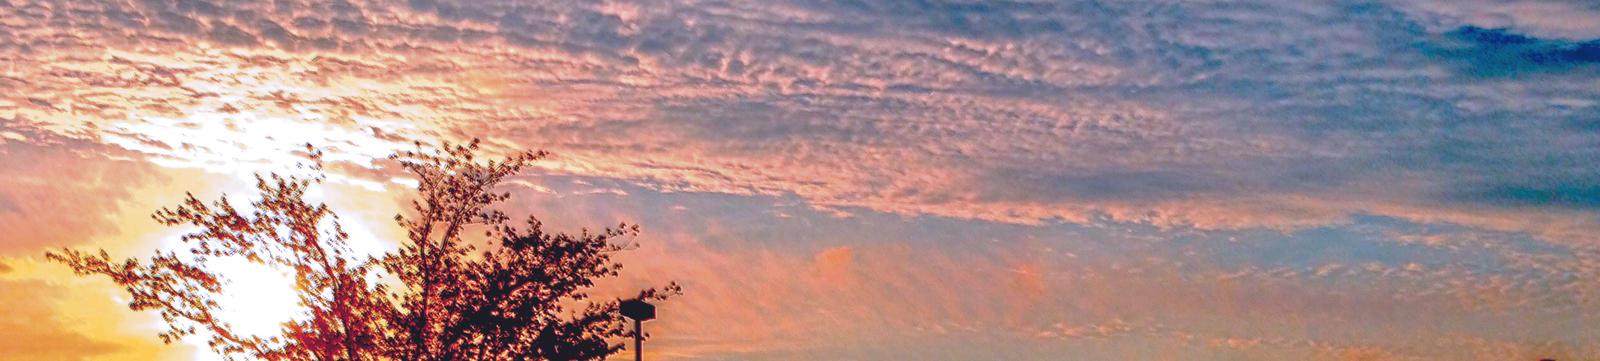 Cloud sunset 4.1